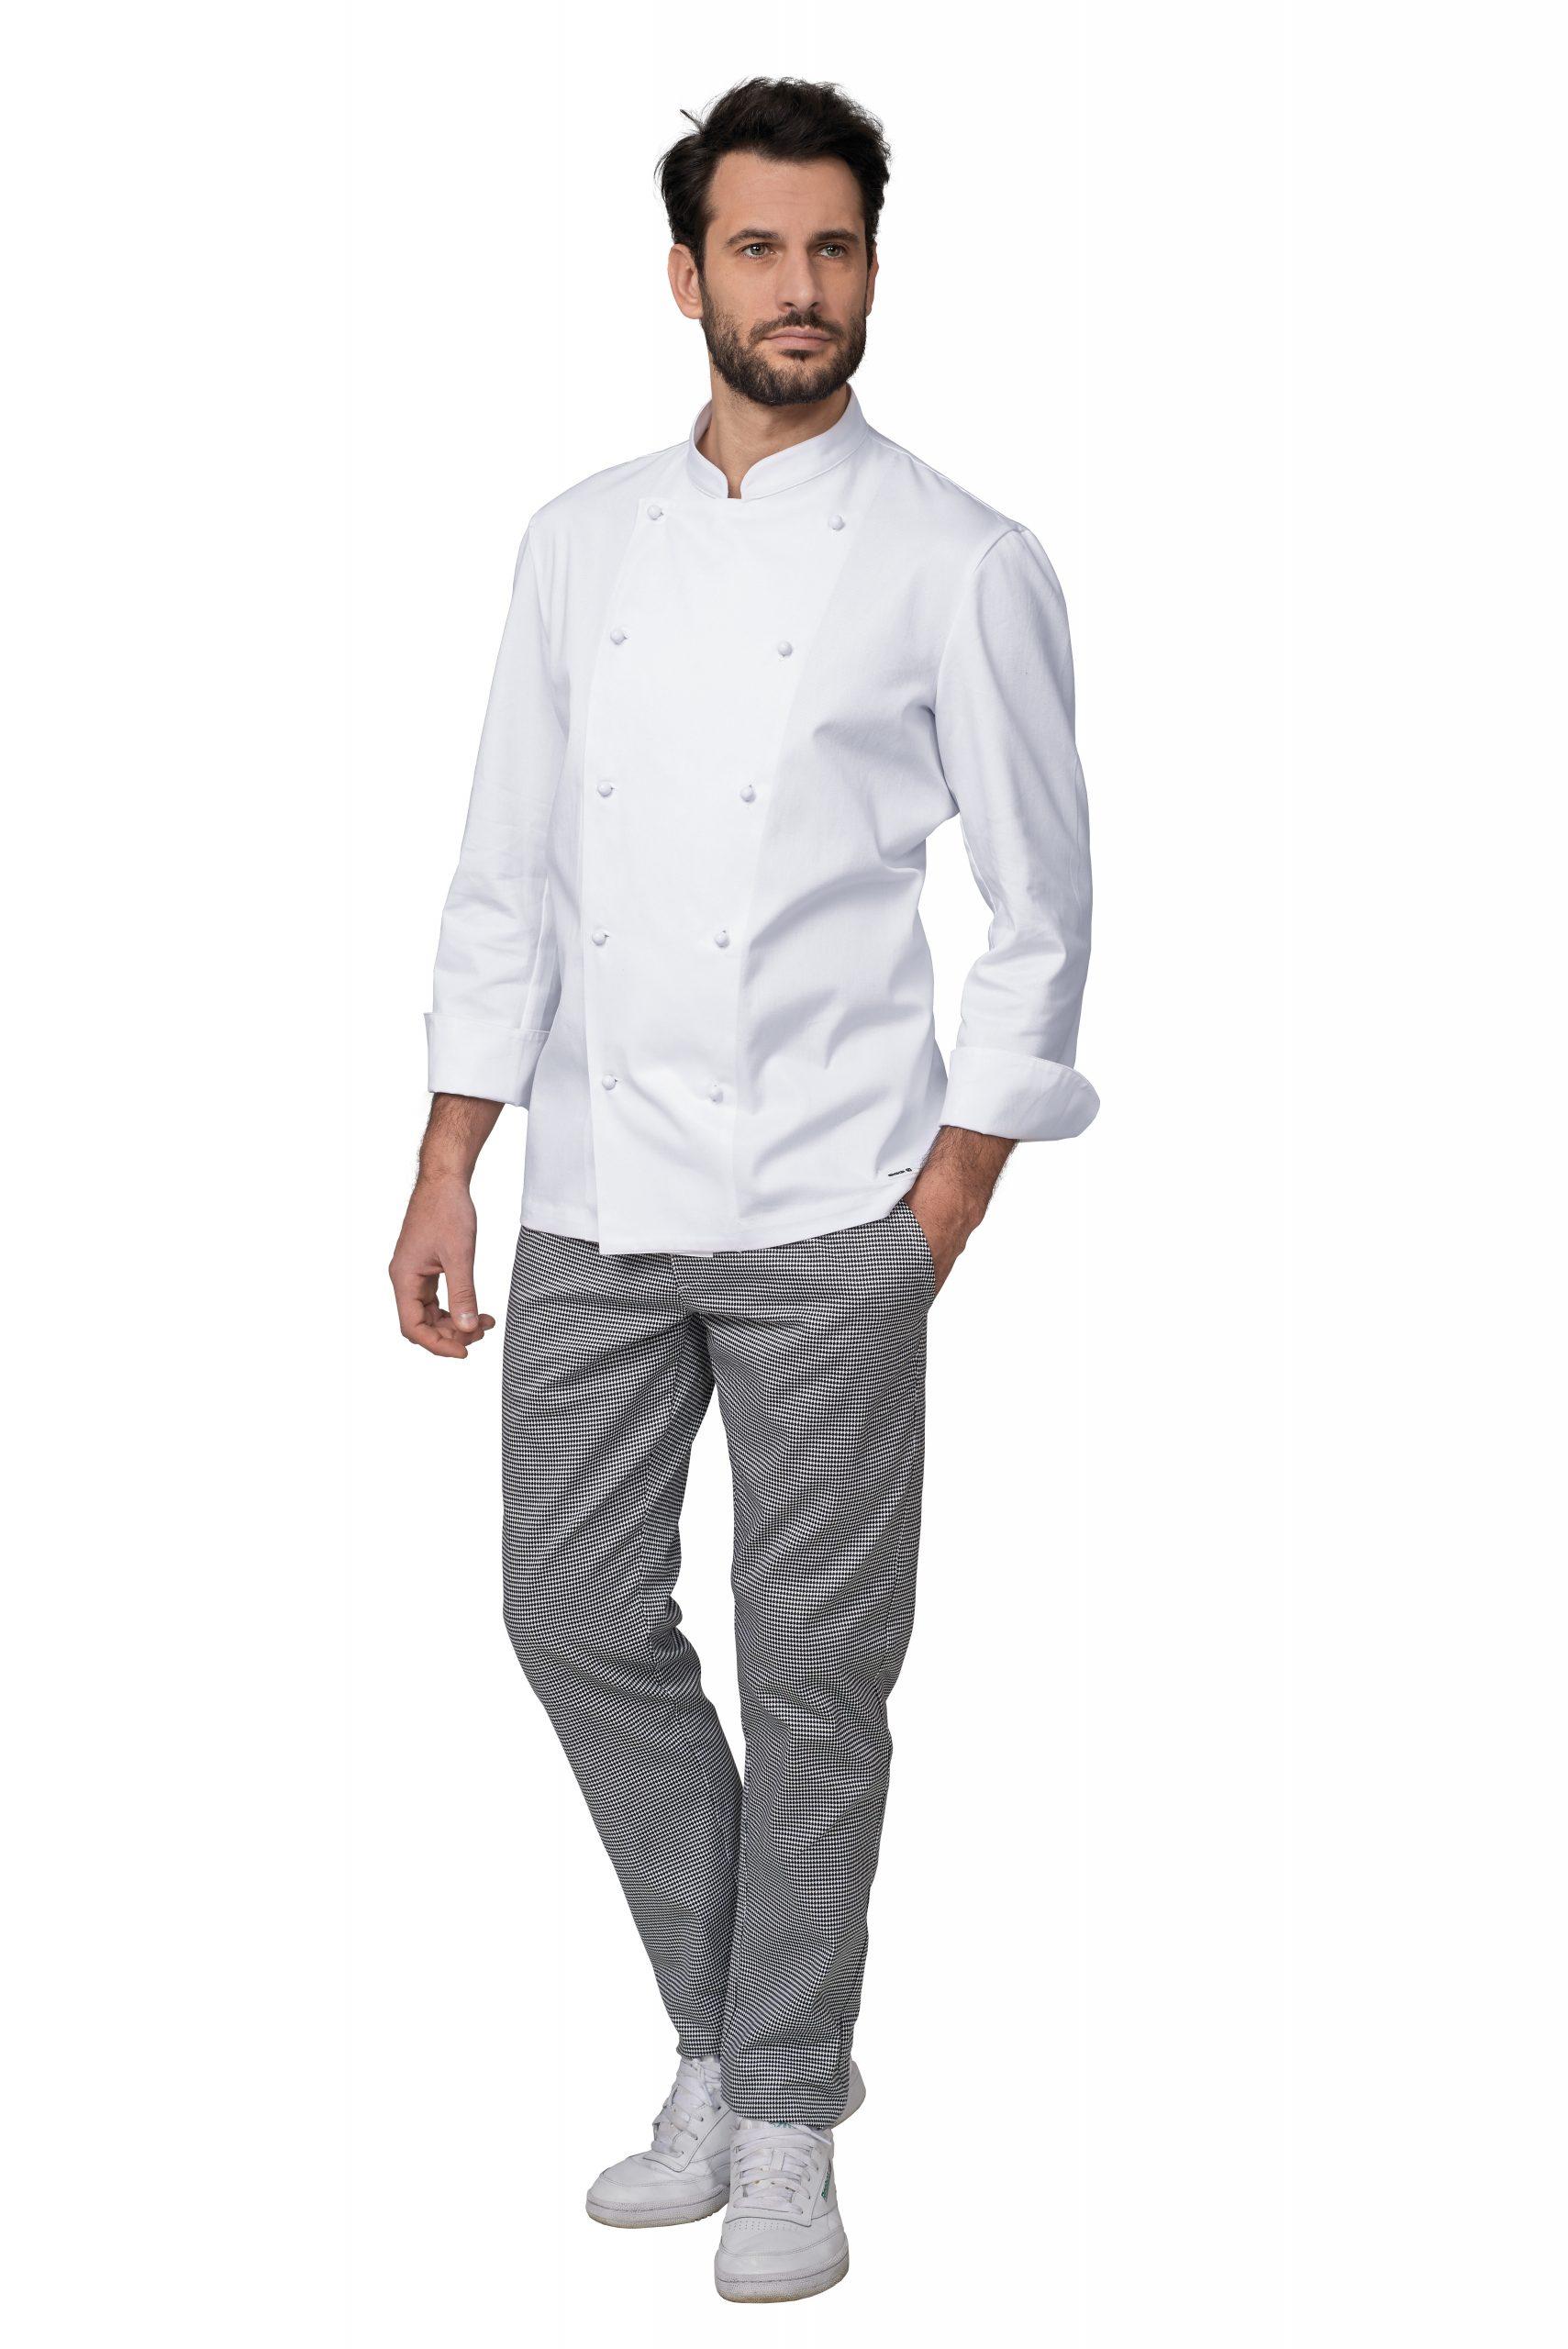 Artur, Giacca chef